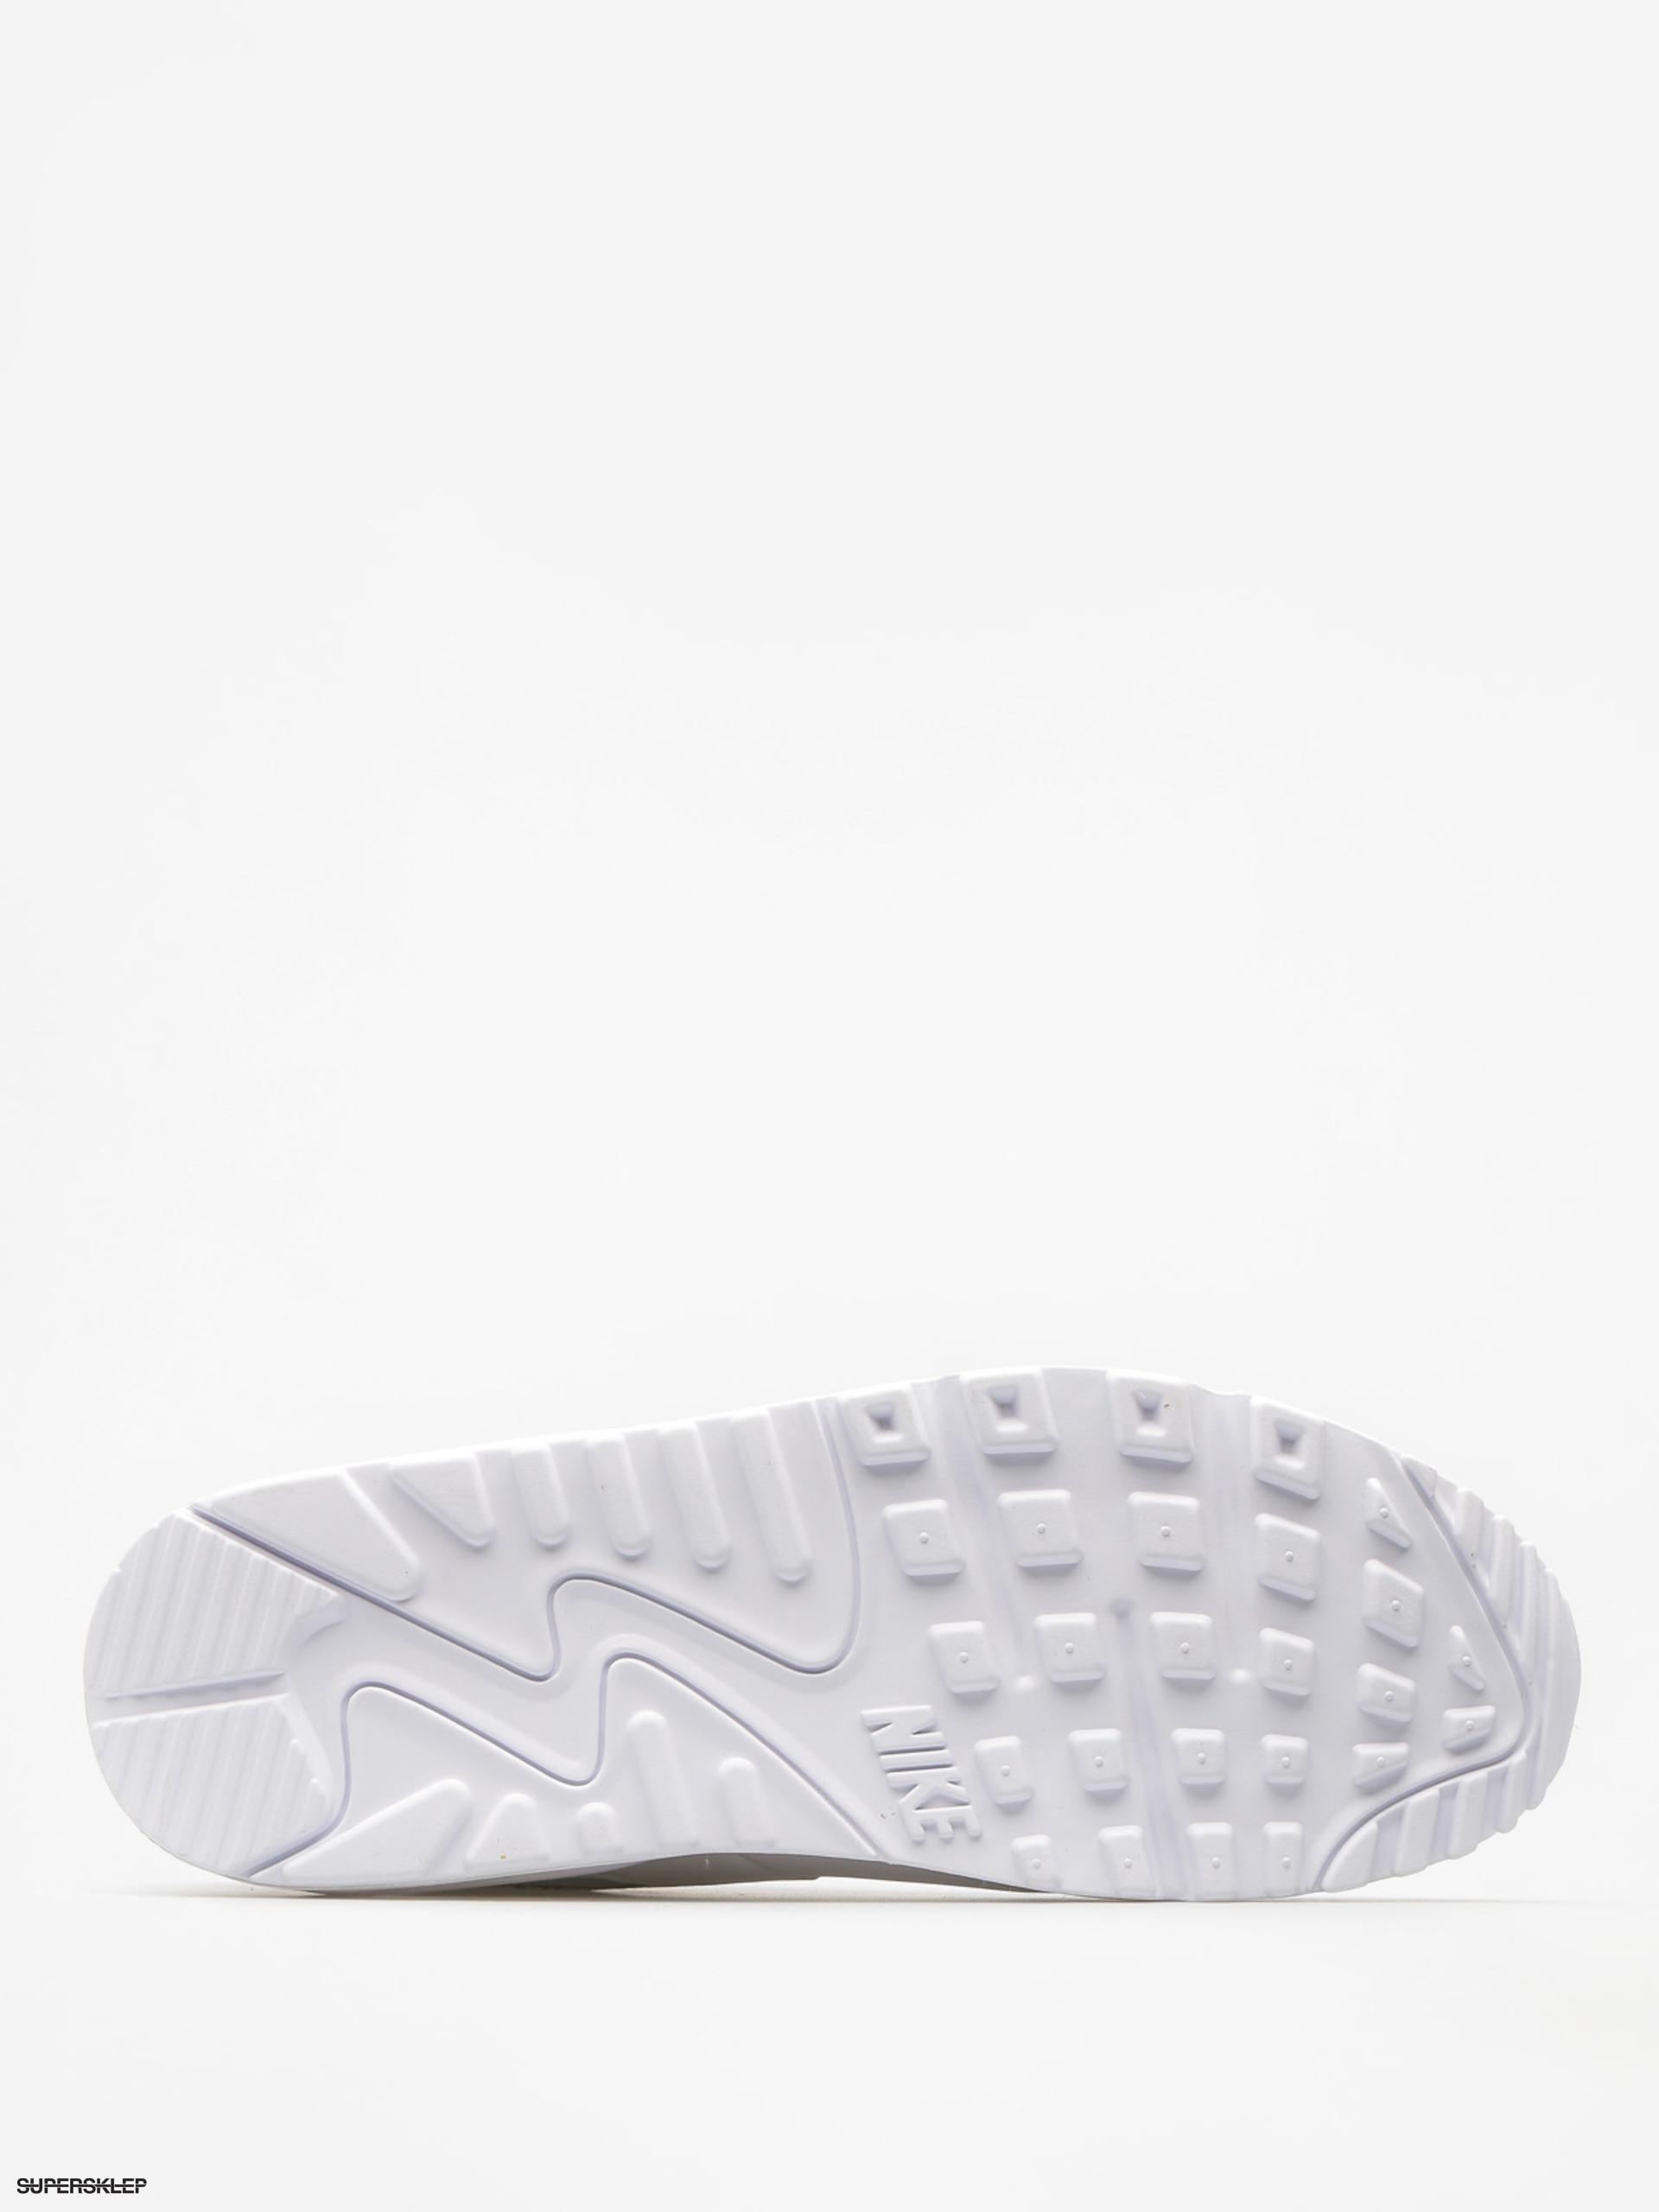 Nike Air Max 90 Leather Męskie Białe (302519 113)